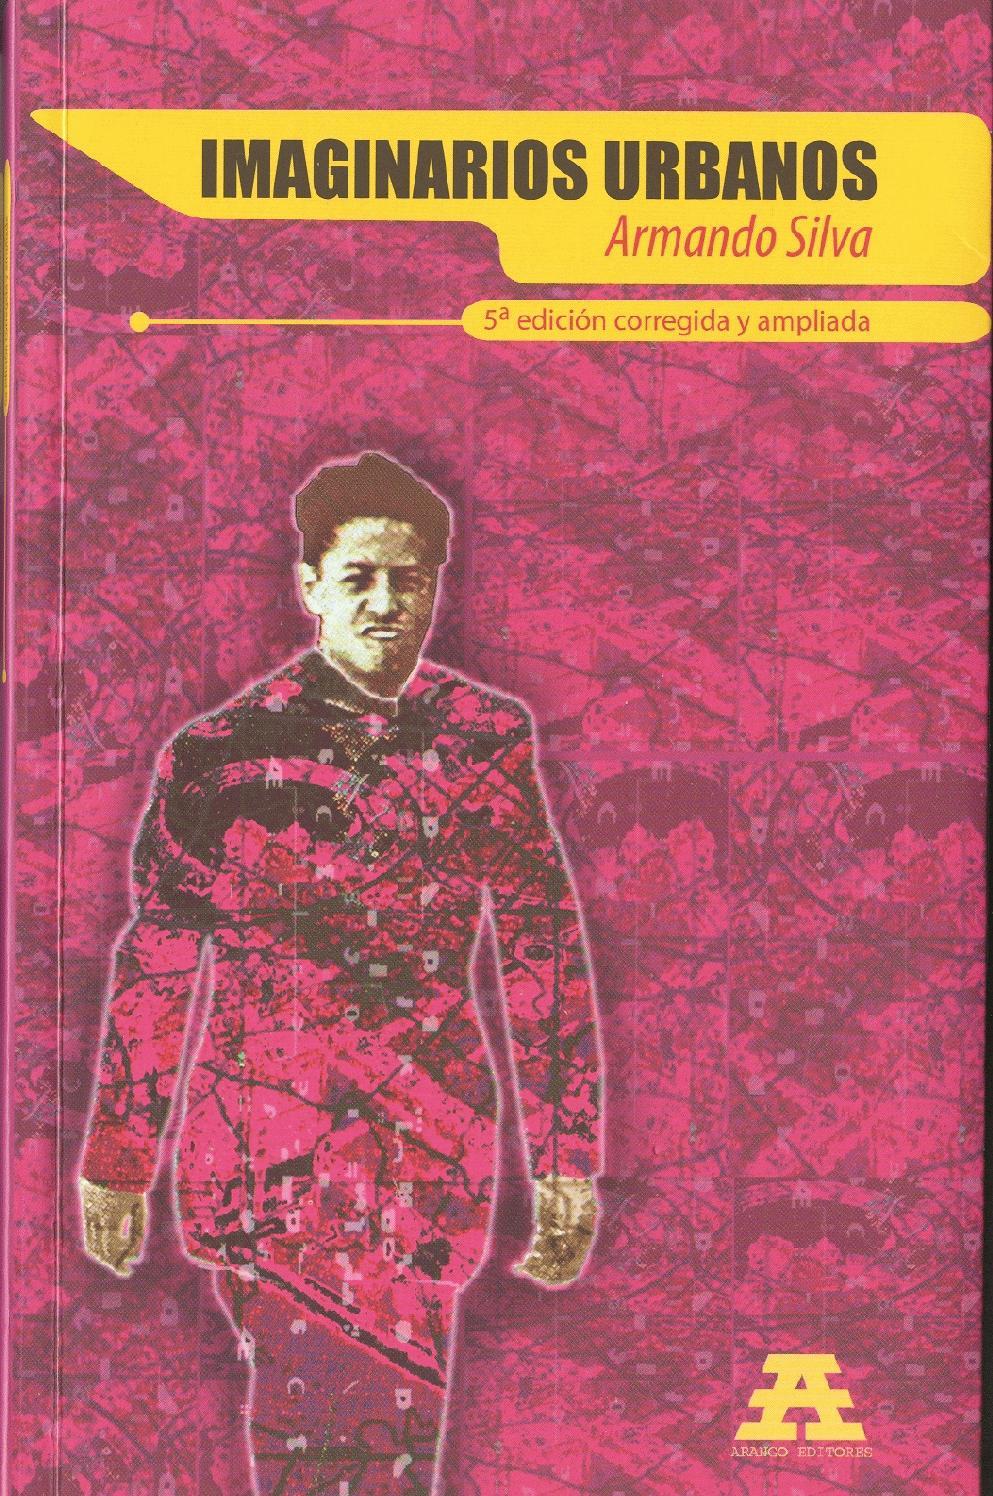 Imaginarios Urbanos - Armando Silva by Dis Edson - issuu